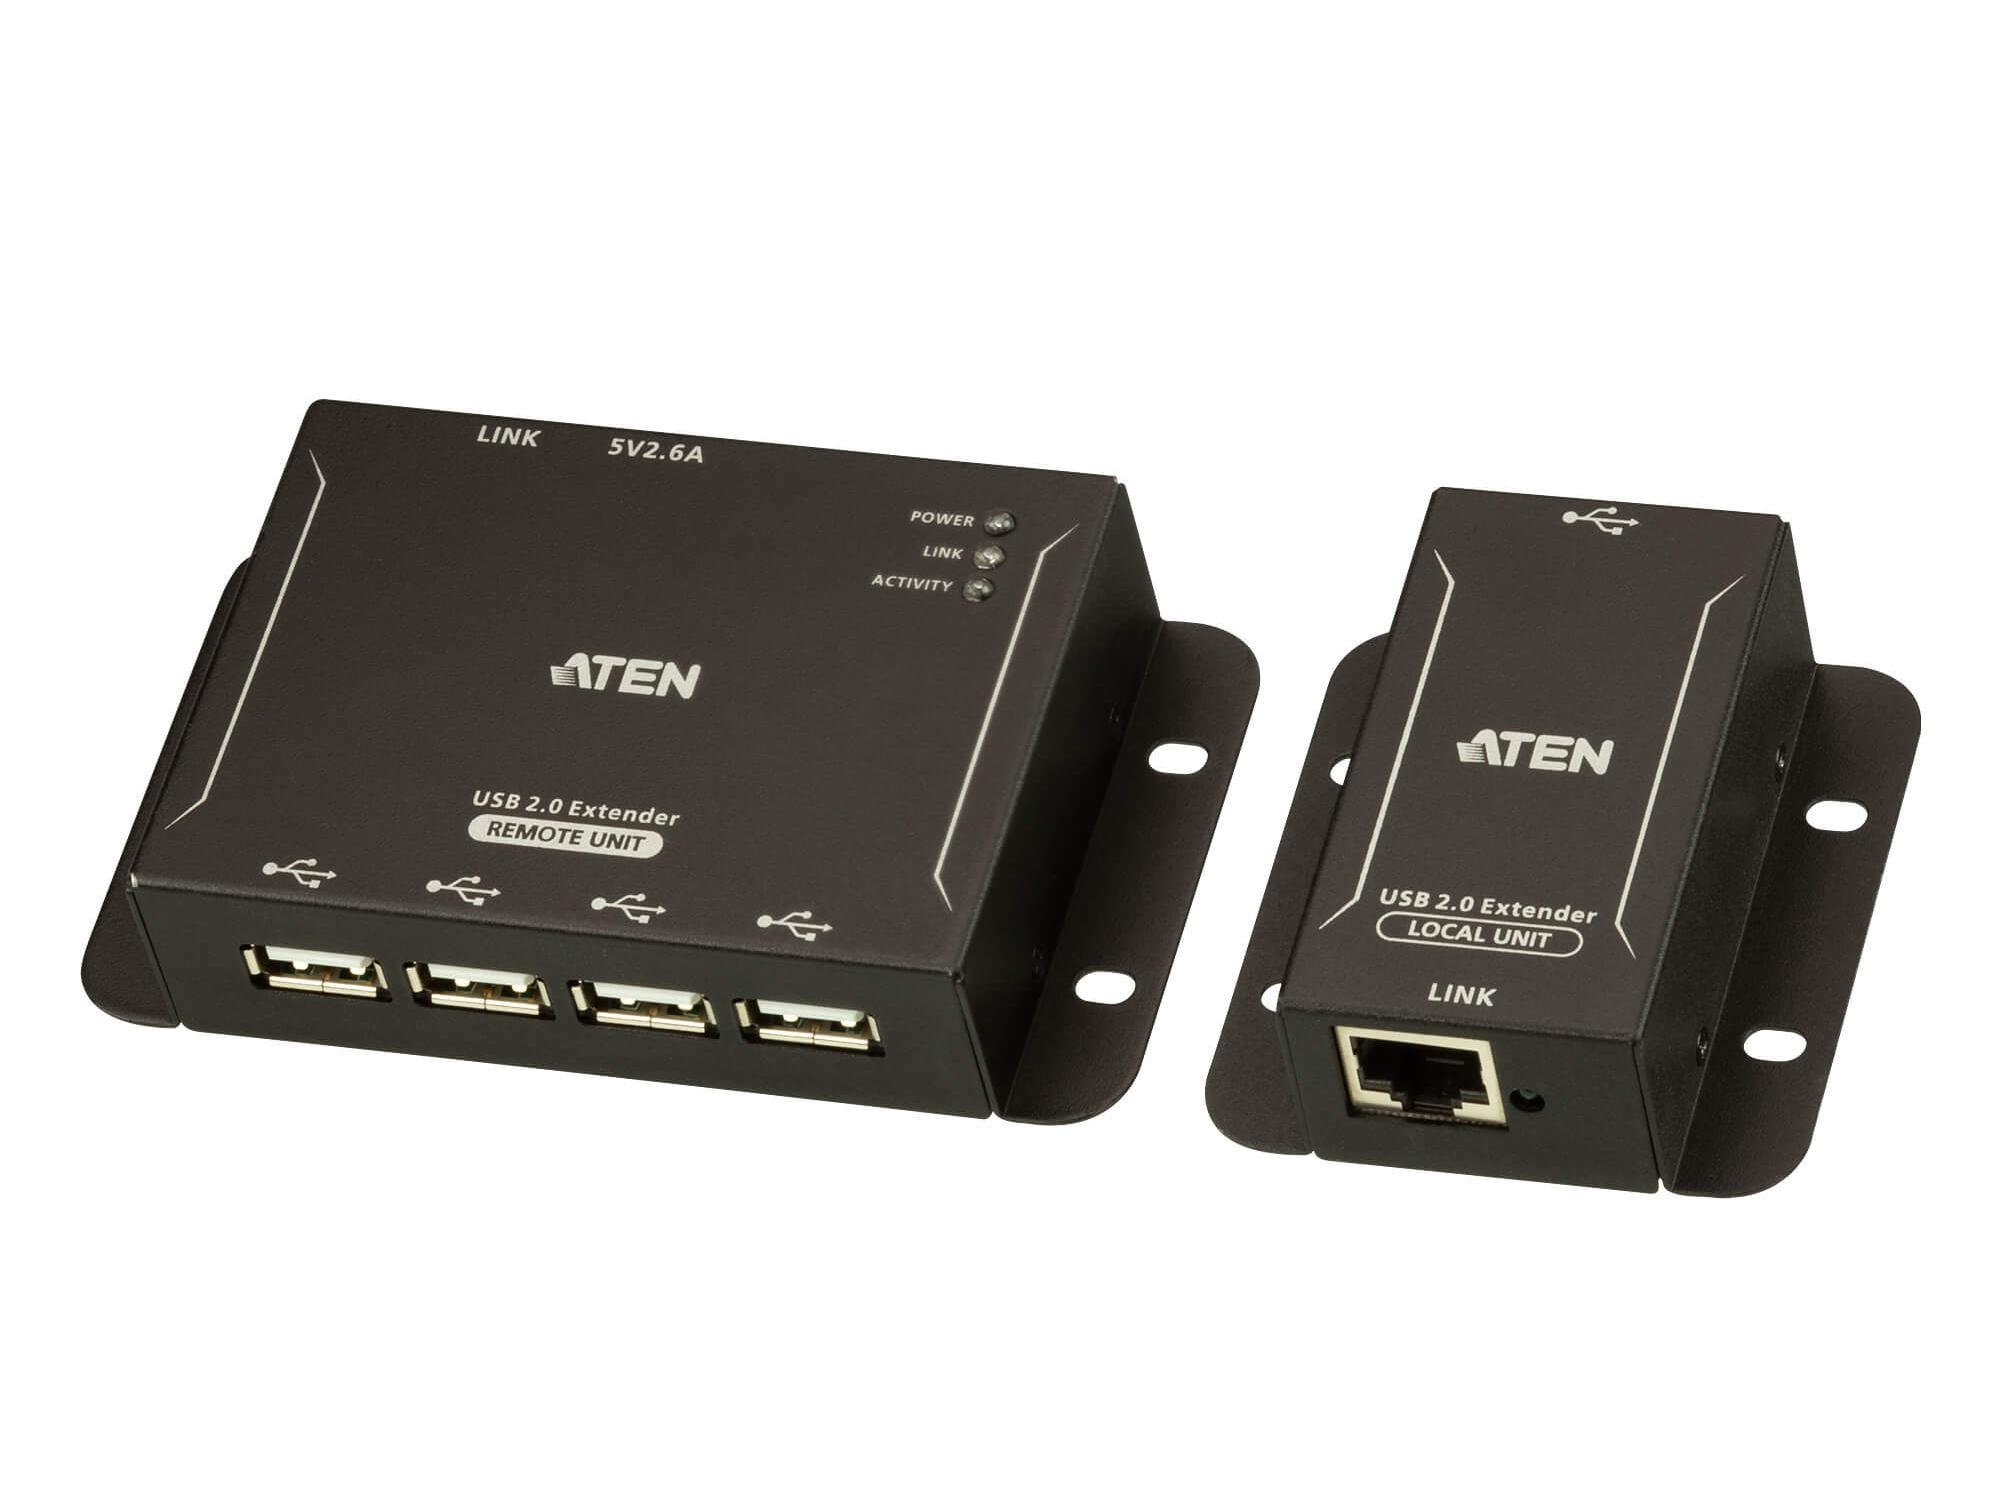 Aten UCE3250 4-port USB 2.0 CAT 5 Extender (Transmitter/Receiver) Set/up to 50m